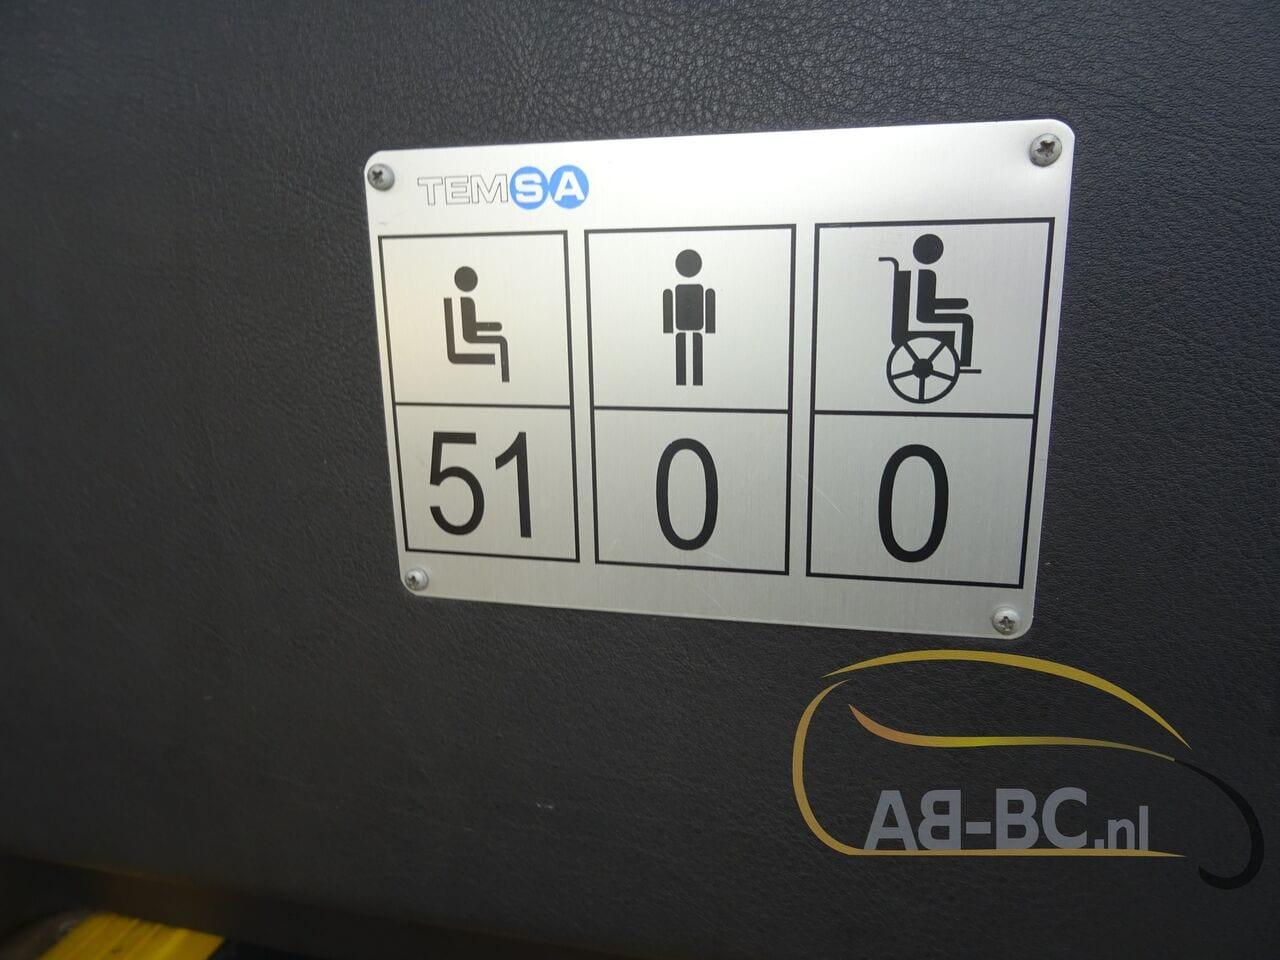 coach-busTEMSA-Safari-RD-53-Seats-DAF-Motor-12-mtr---1616166684134572111_big_299cbc9cdb8685a56b10dda7a755ba0c--21031917053743807500